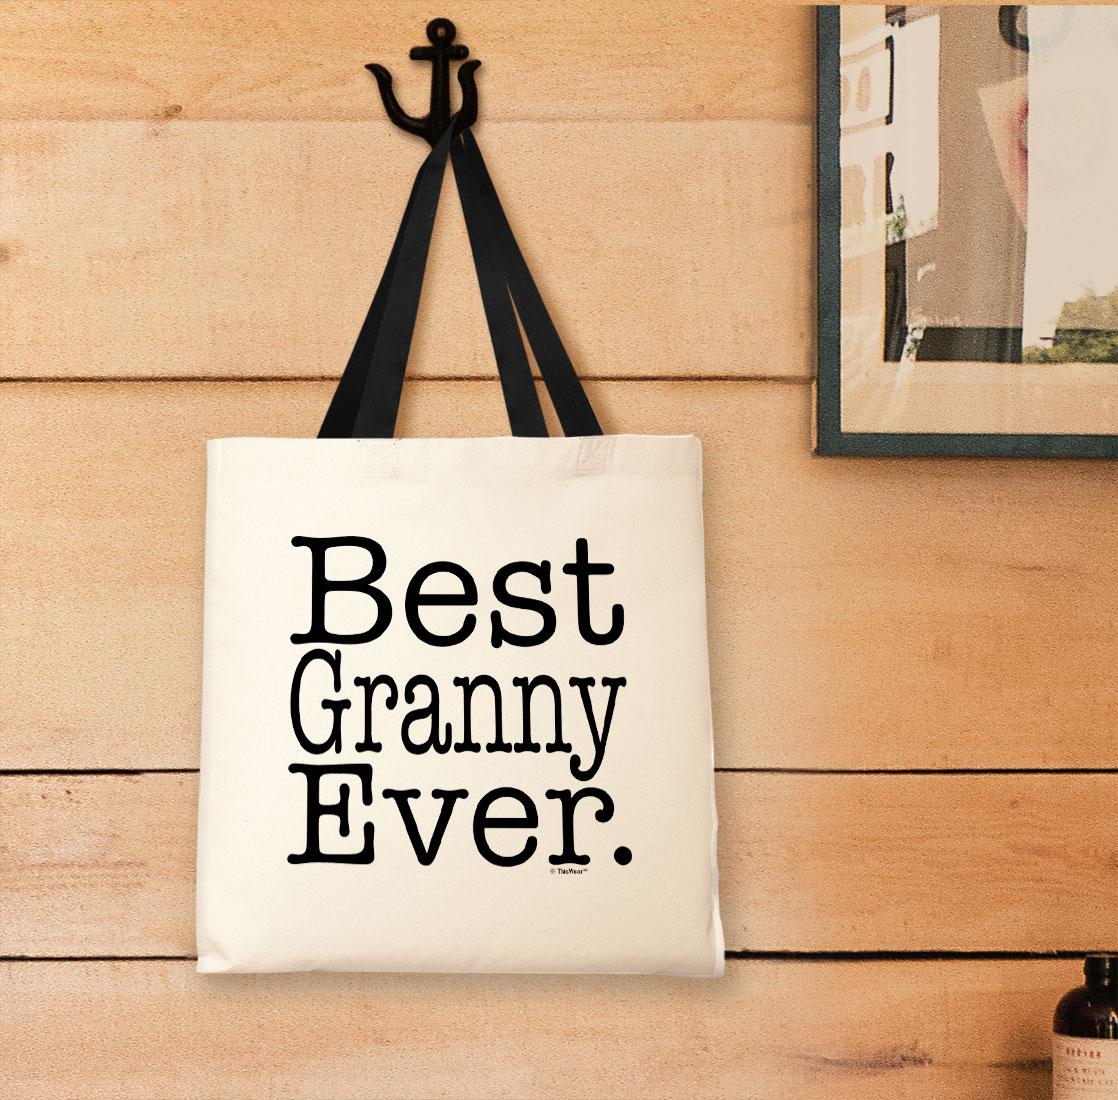 New Grandma Gifts Best Granny Ever Gift Ideas for Grandma Black Canvas Tote Bag